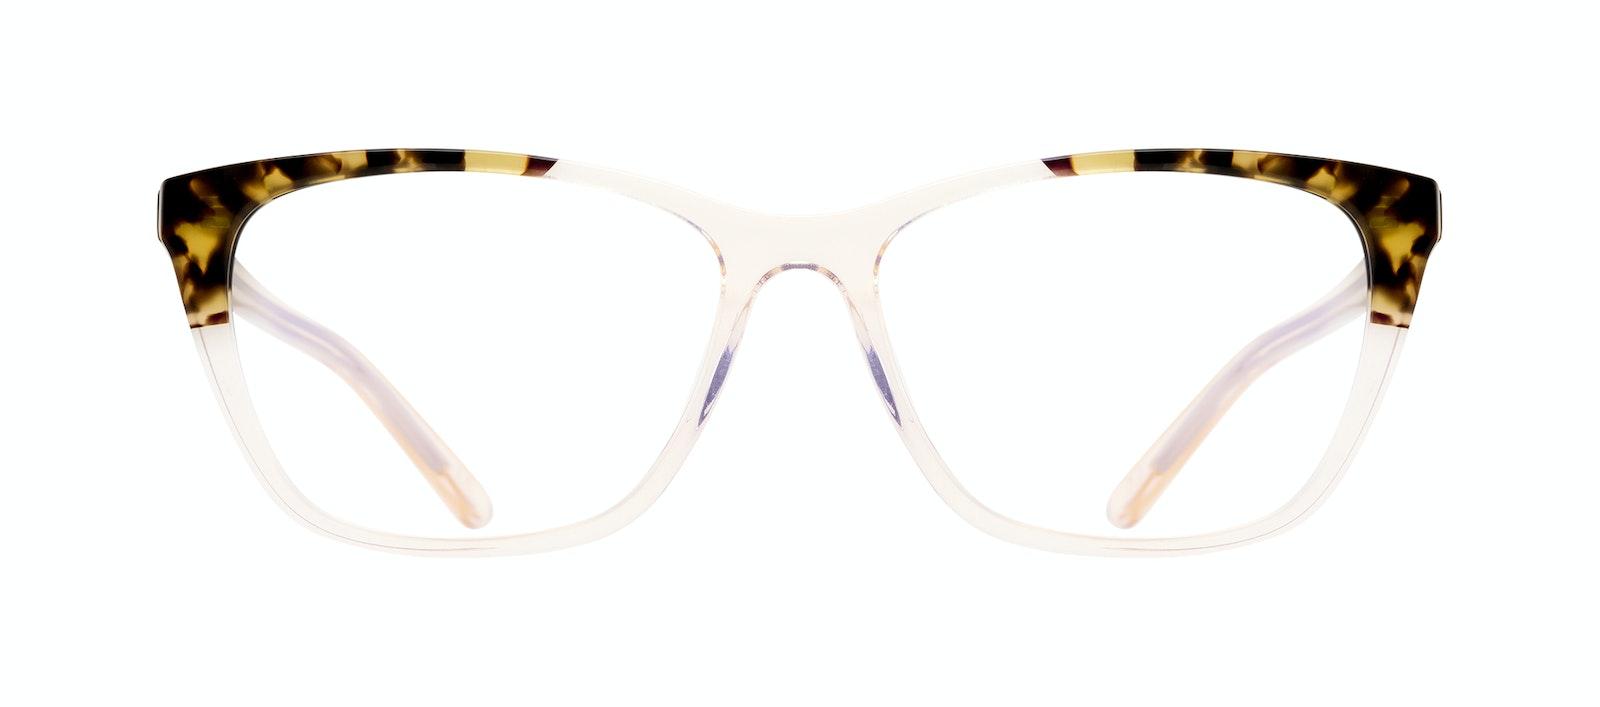 Affordable Fashion Glasses Cat Eye Rectangle Eyeglasses Women Myrtle Blond Tortoise Front